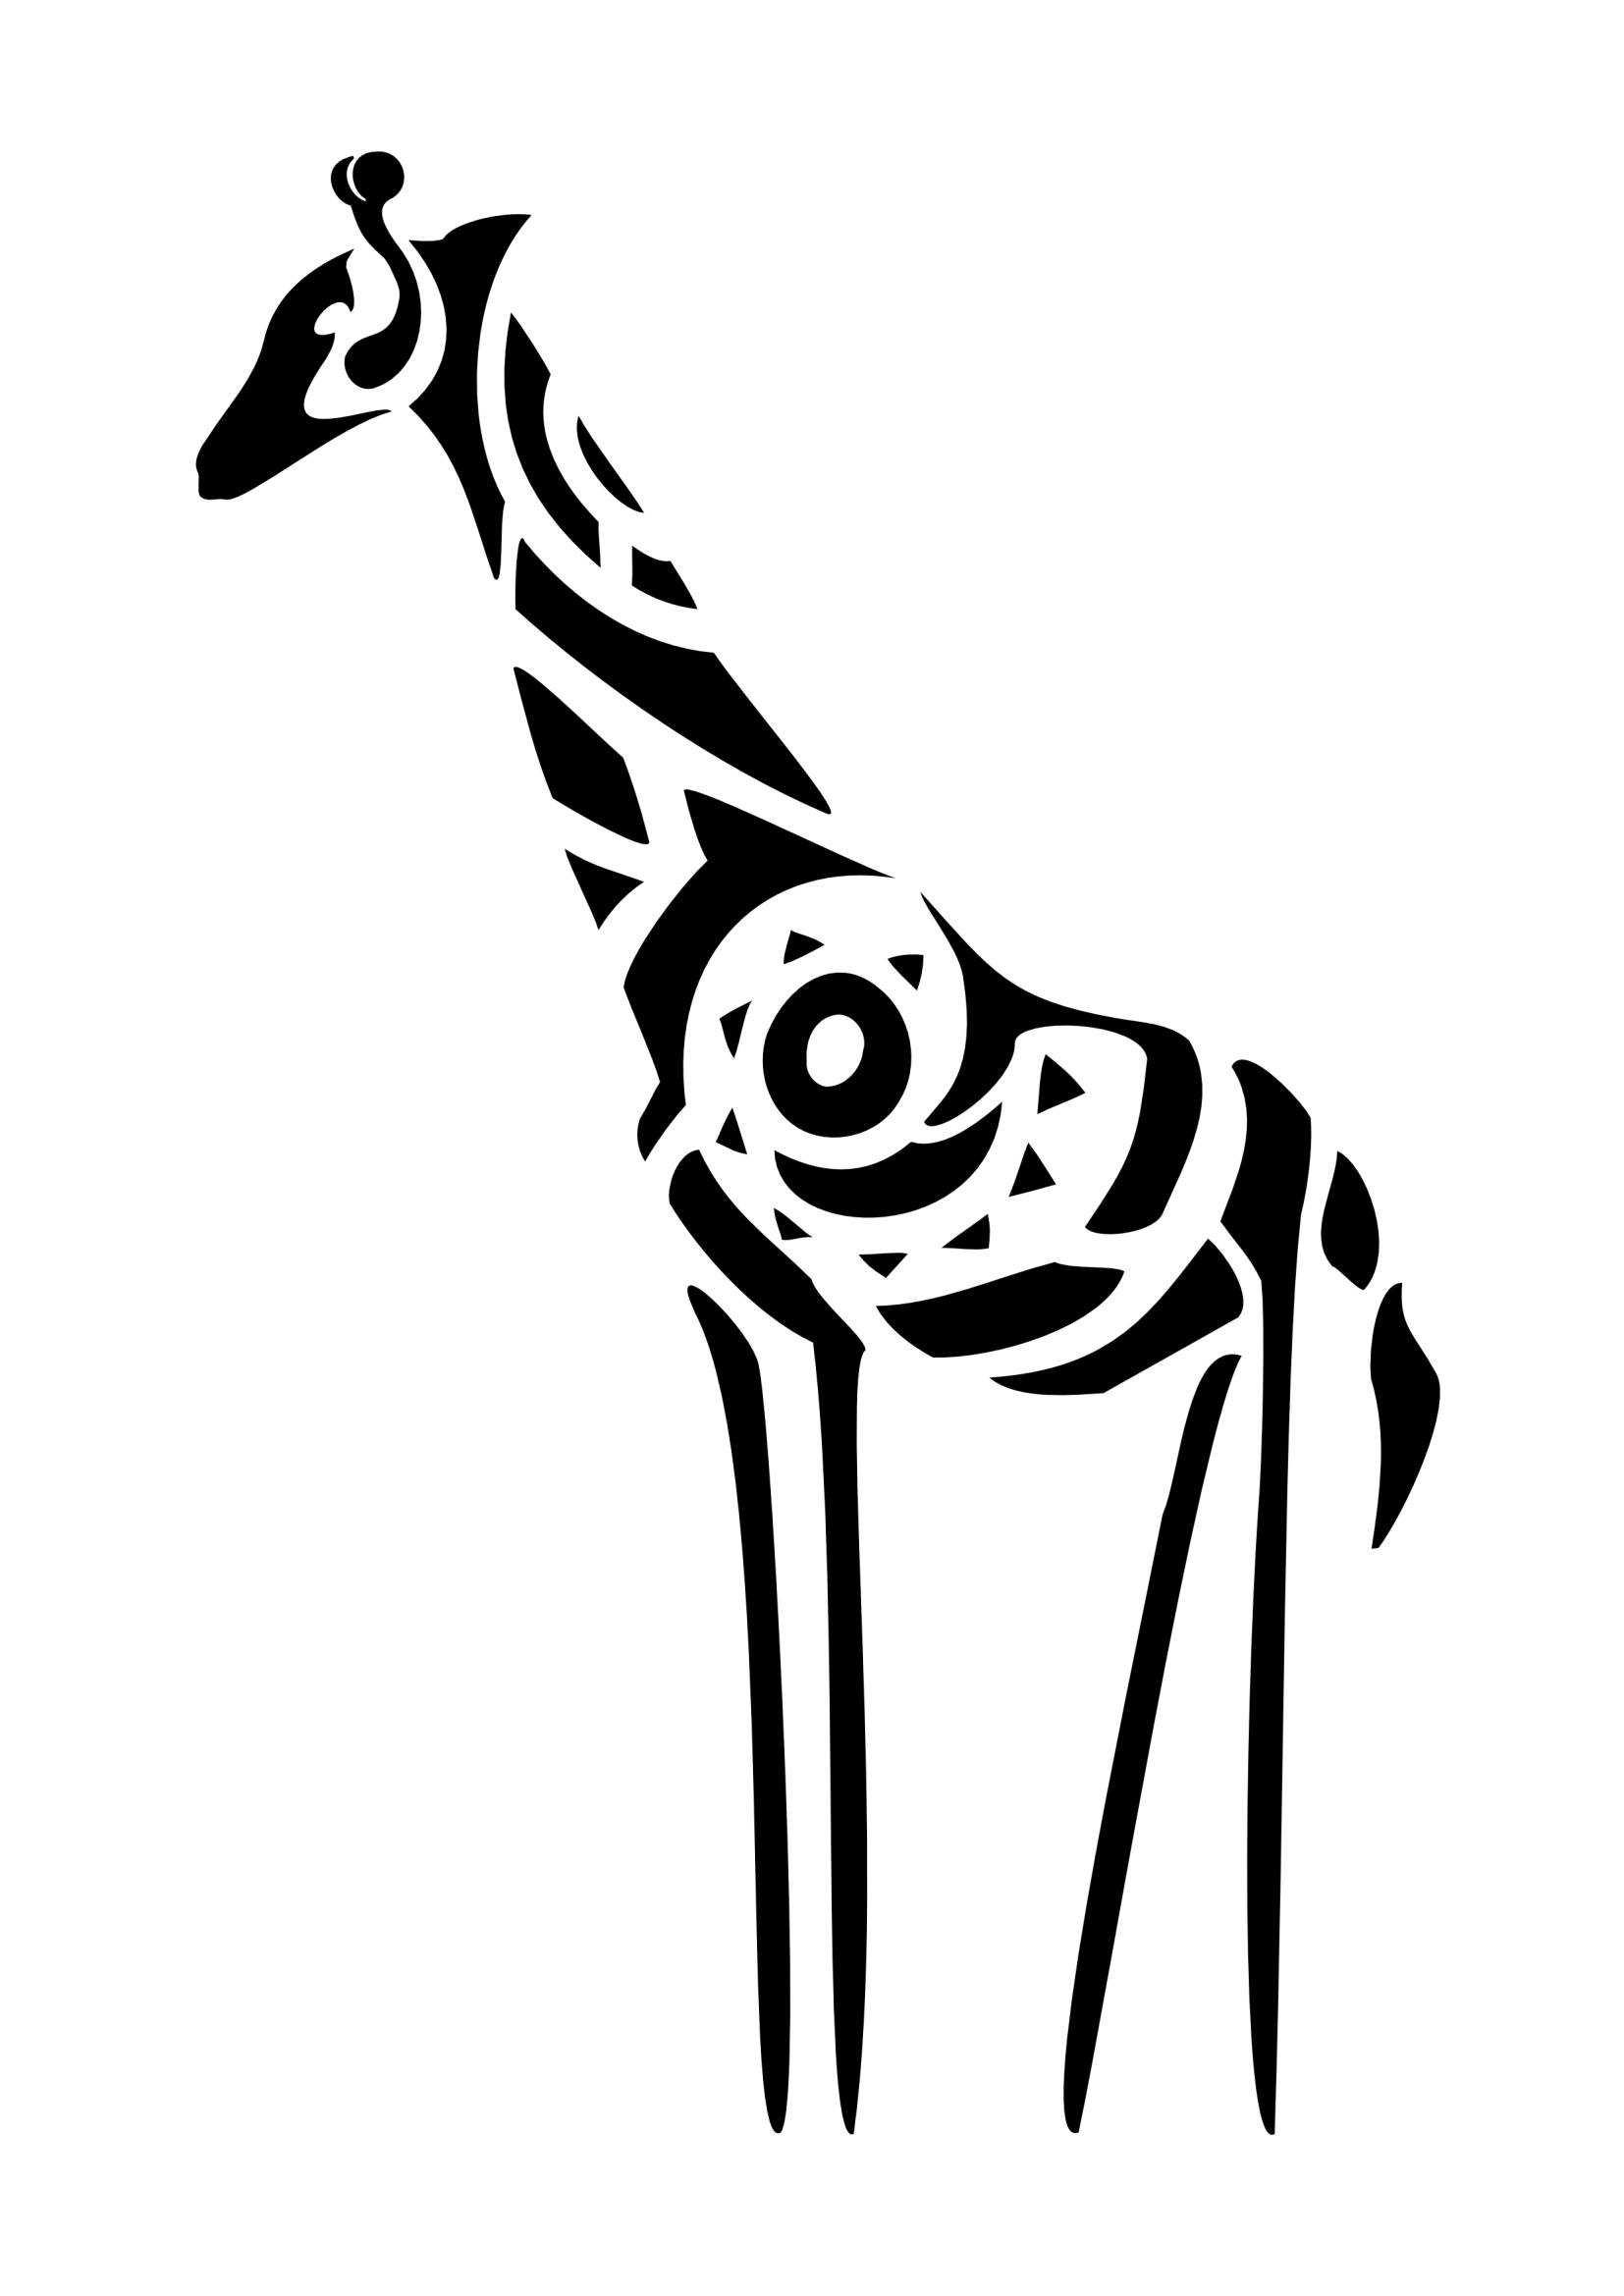 giraffe originality change of perspective view this photo